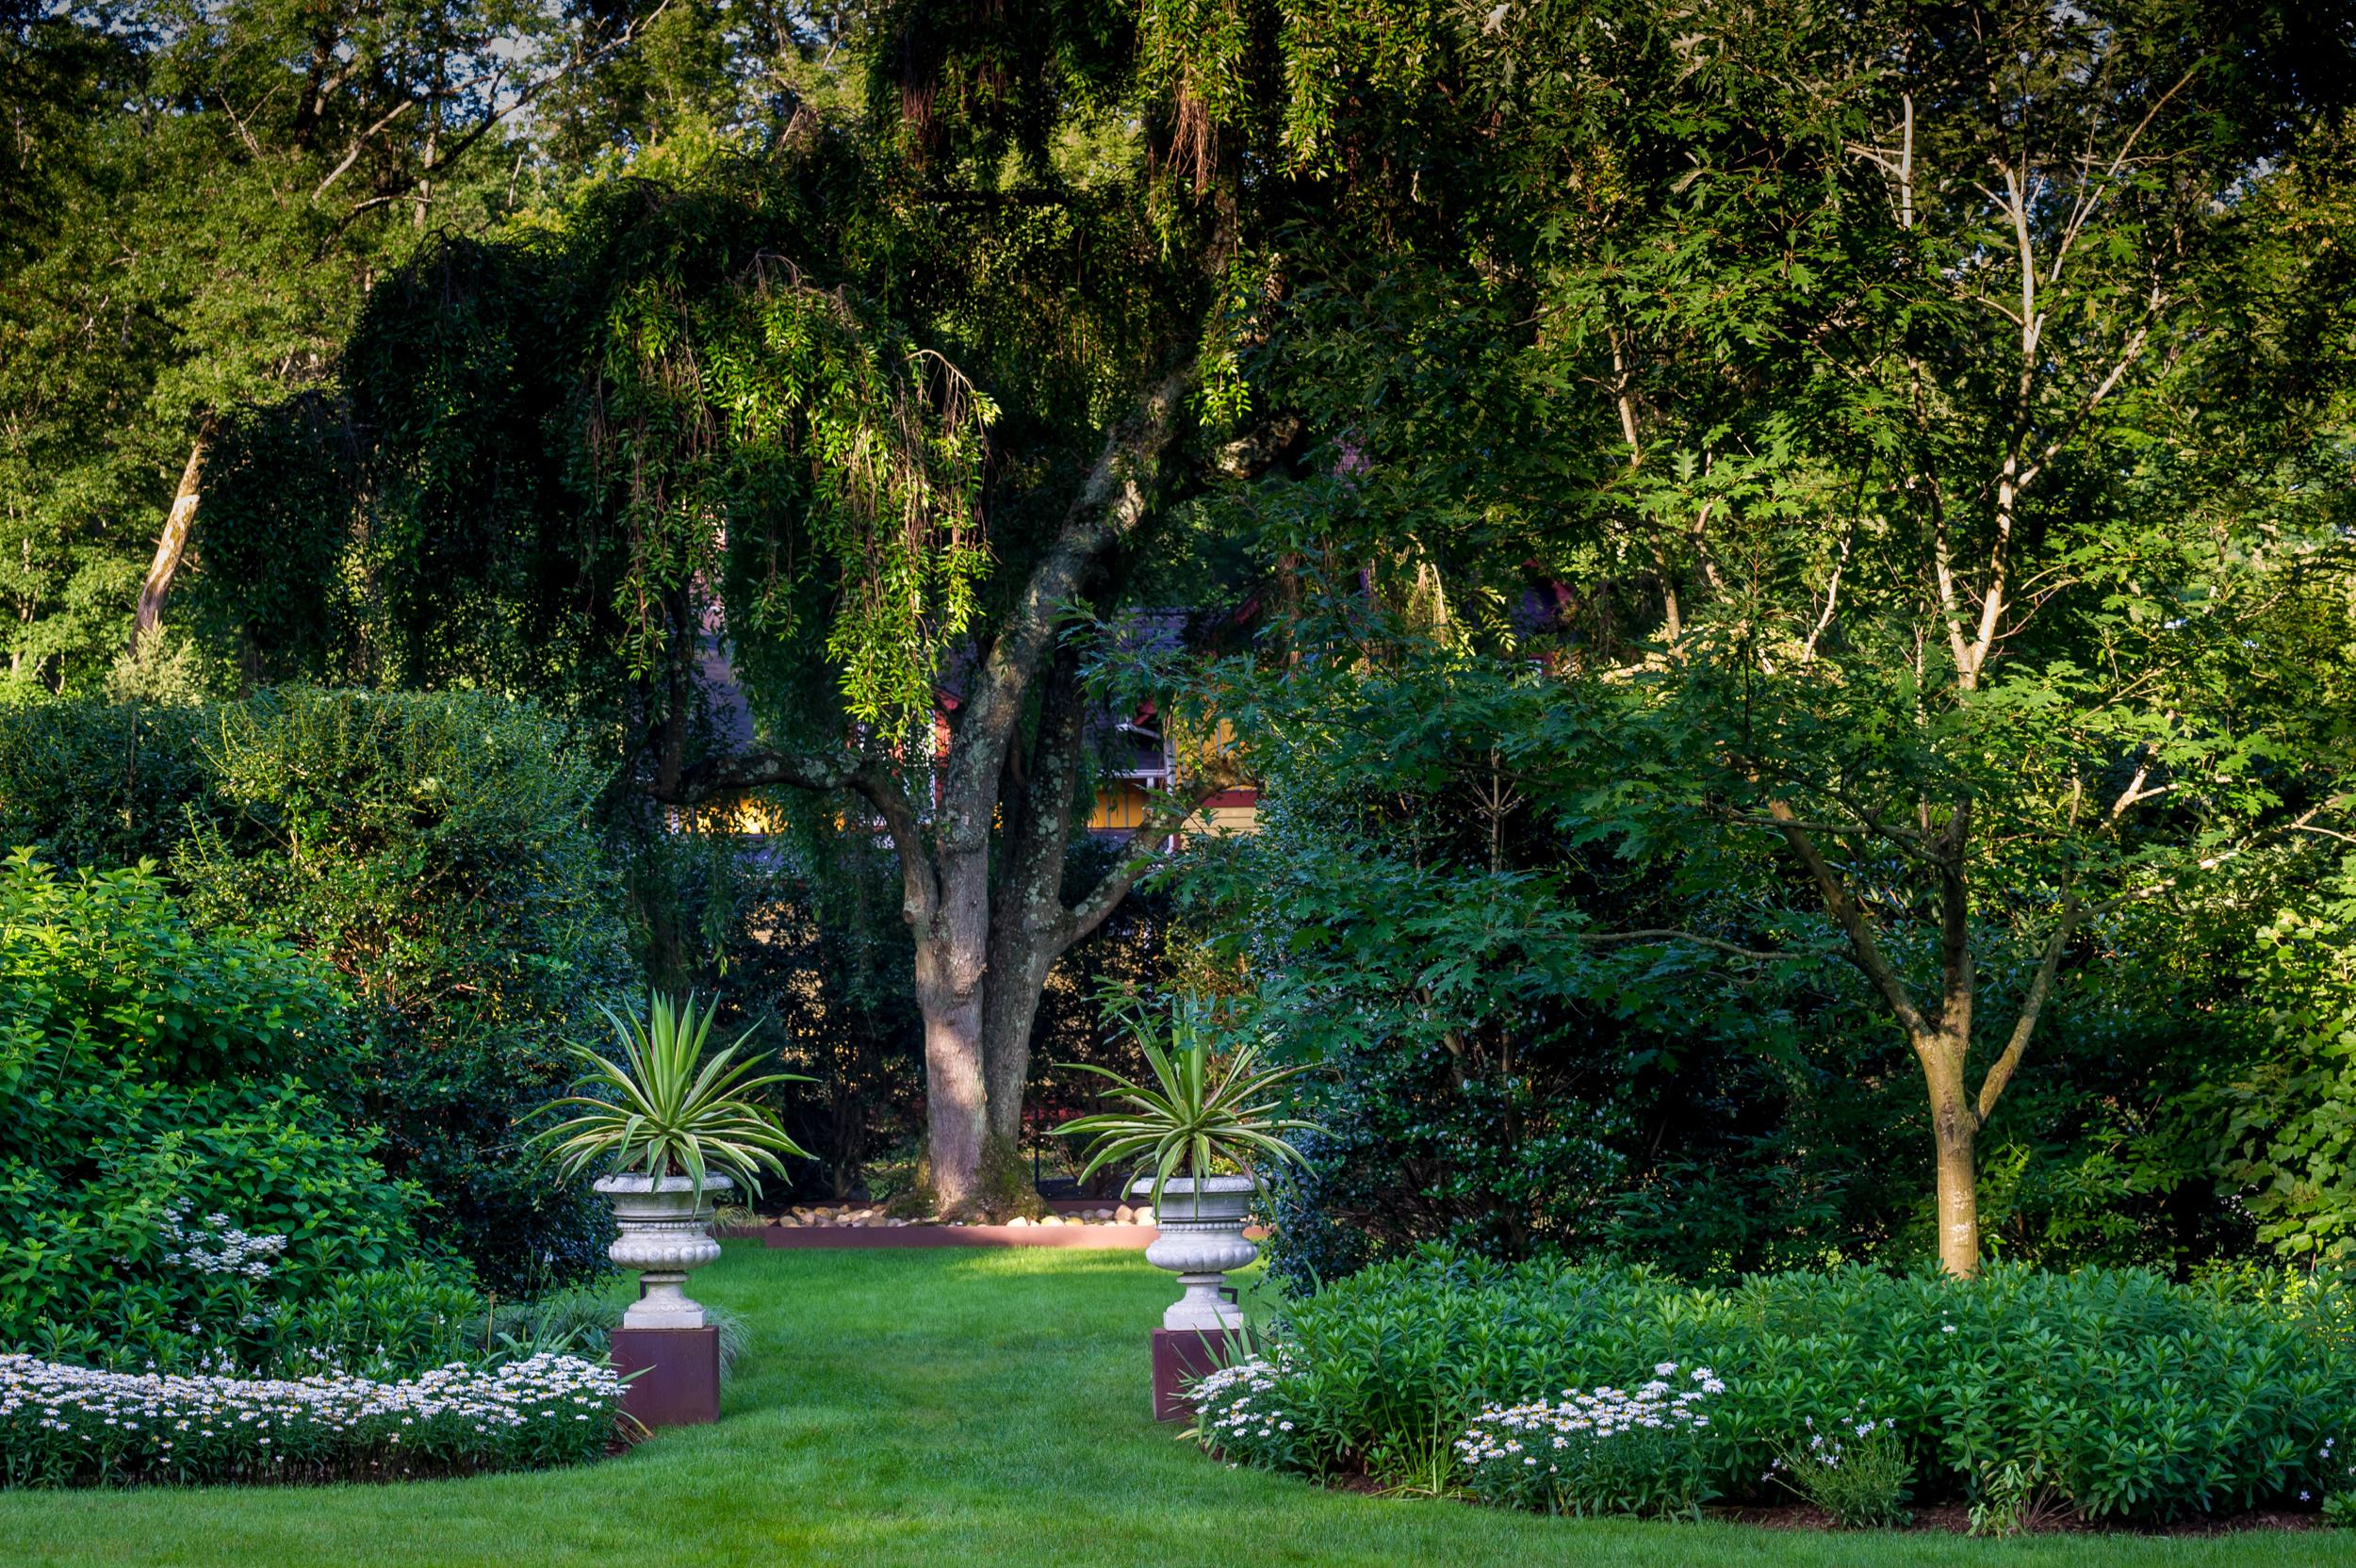 Garden urns in semi-formal setting